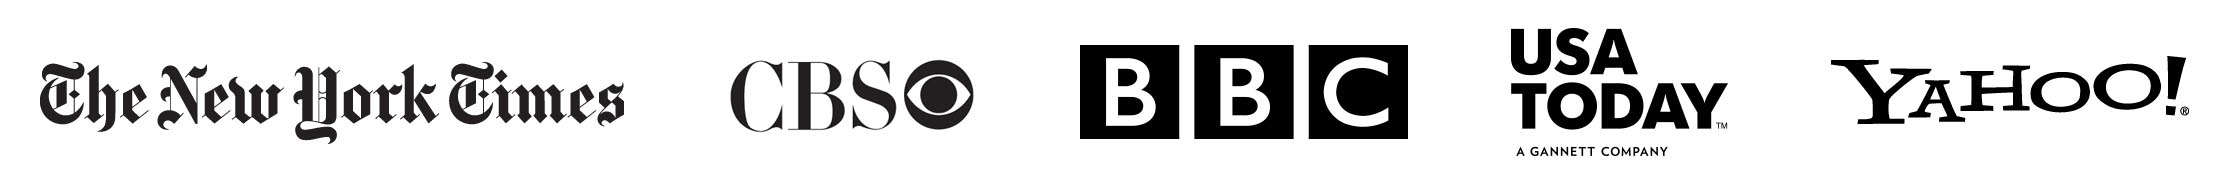 Stevie Soul Bio Media Logos.jpg